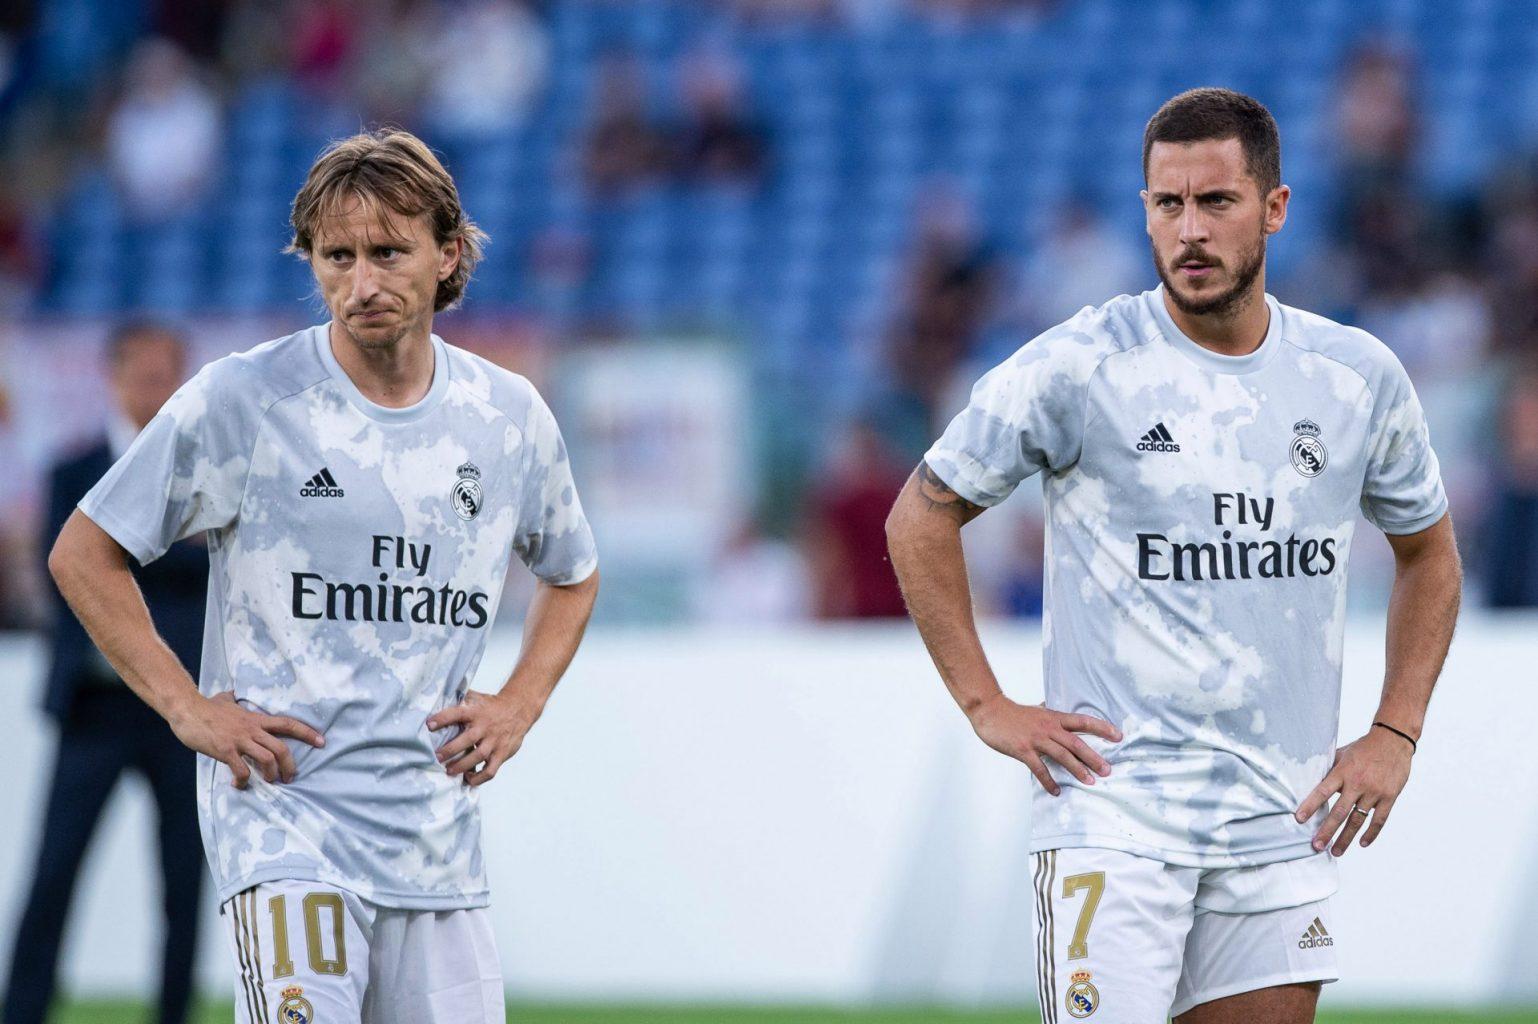 Hazard Needs Time To Get Fit – Real Madrid Midfielder, Modric